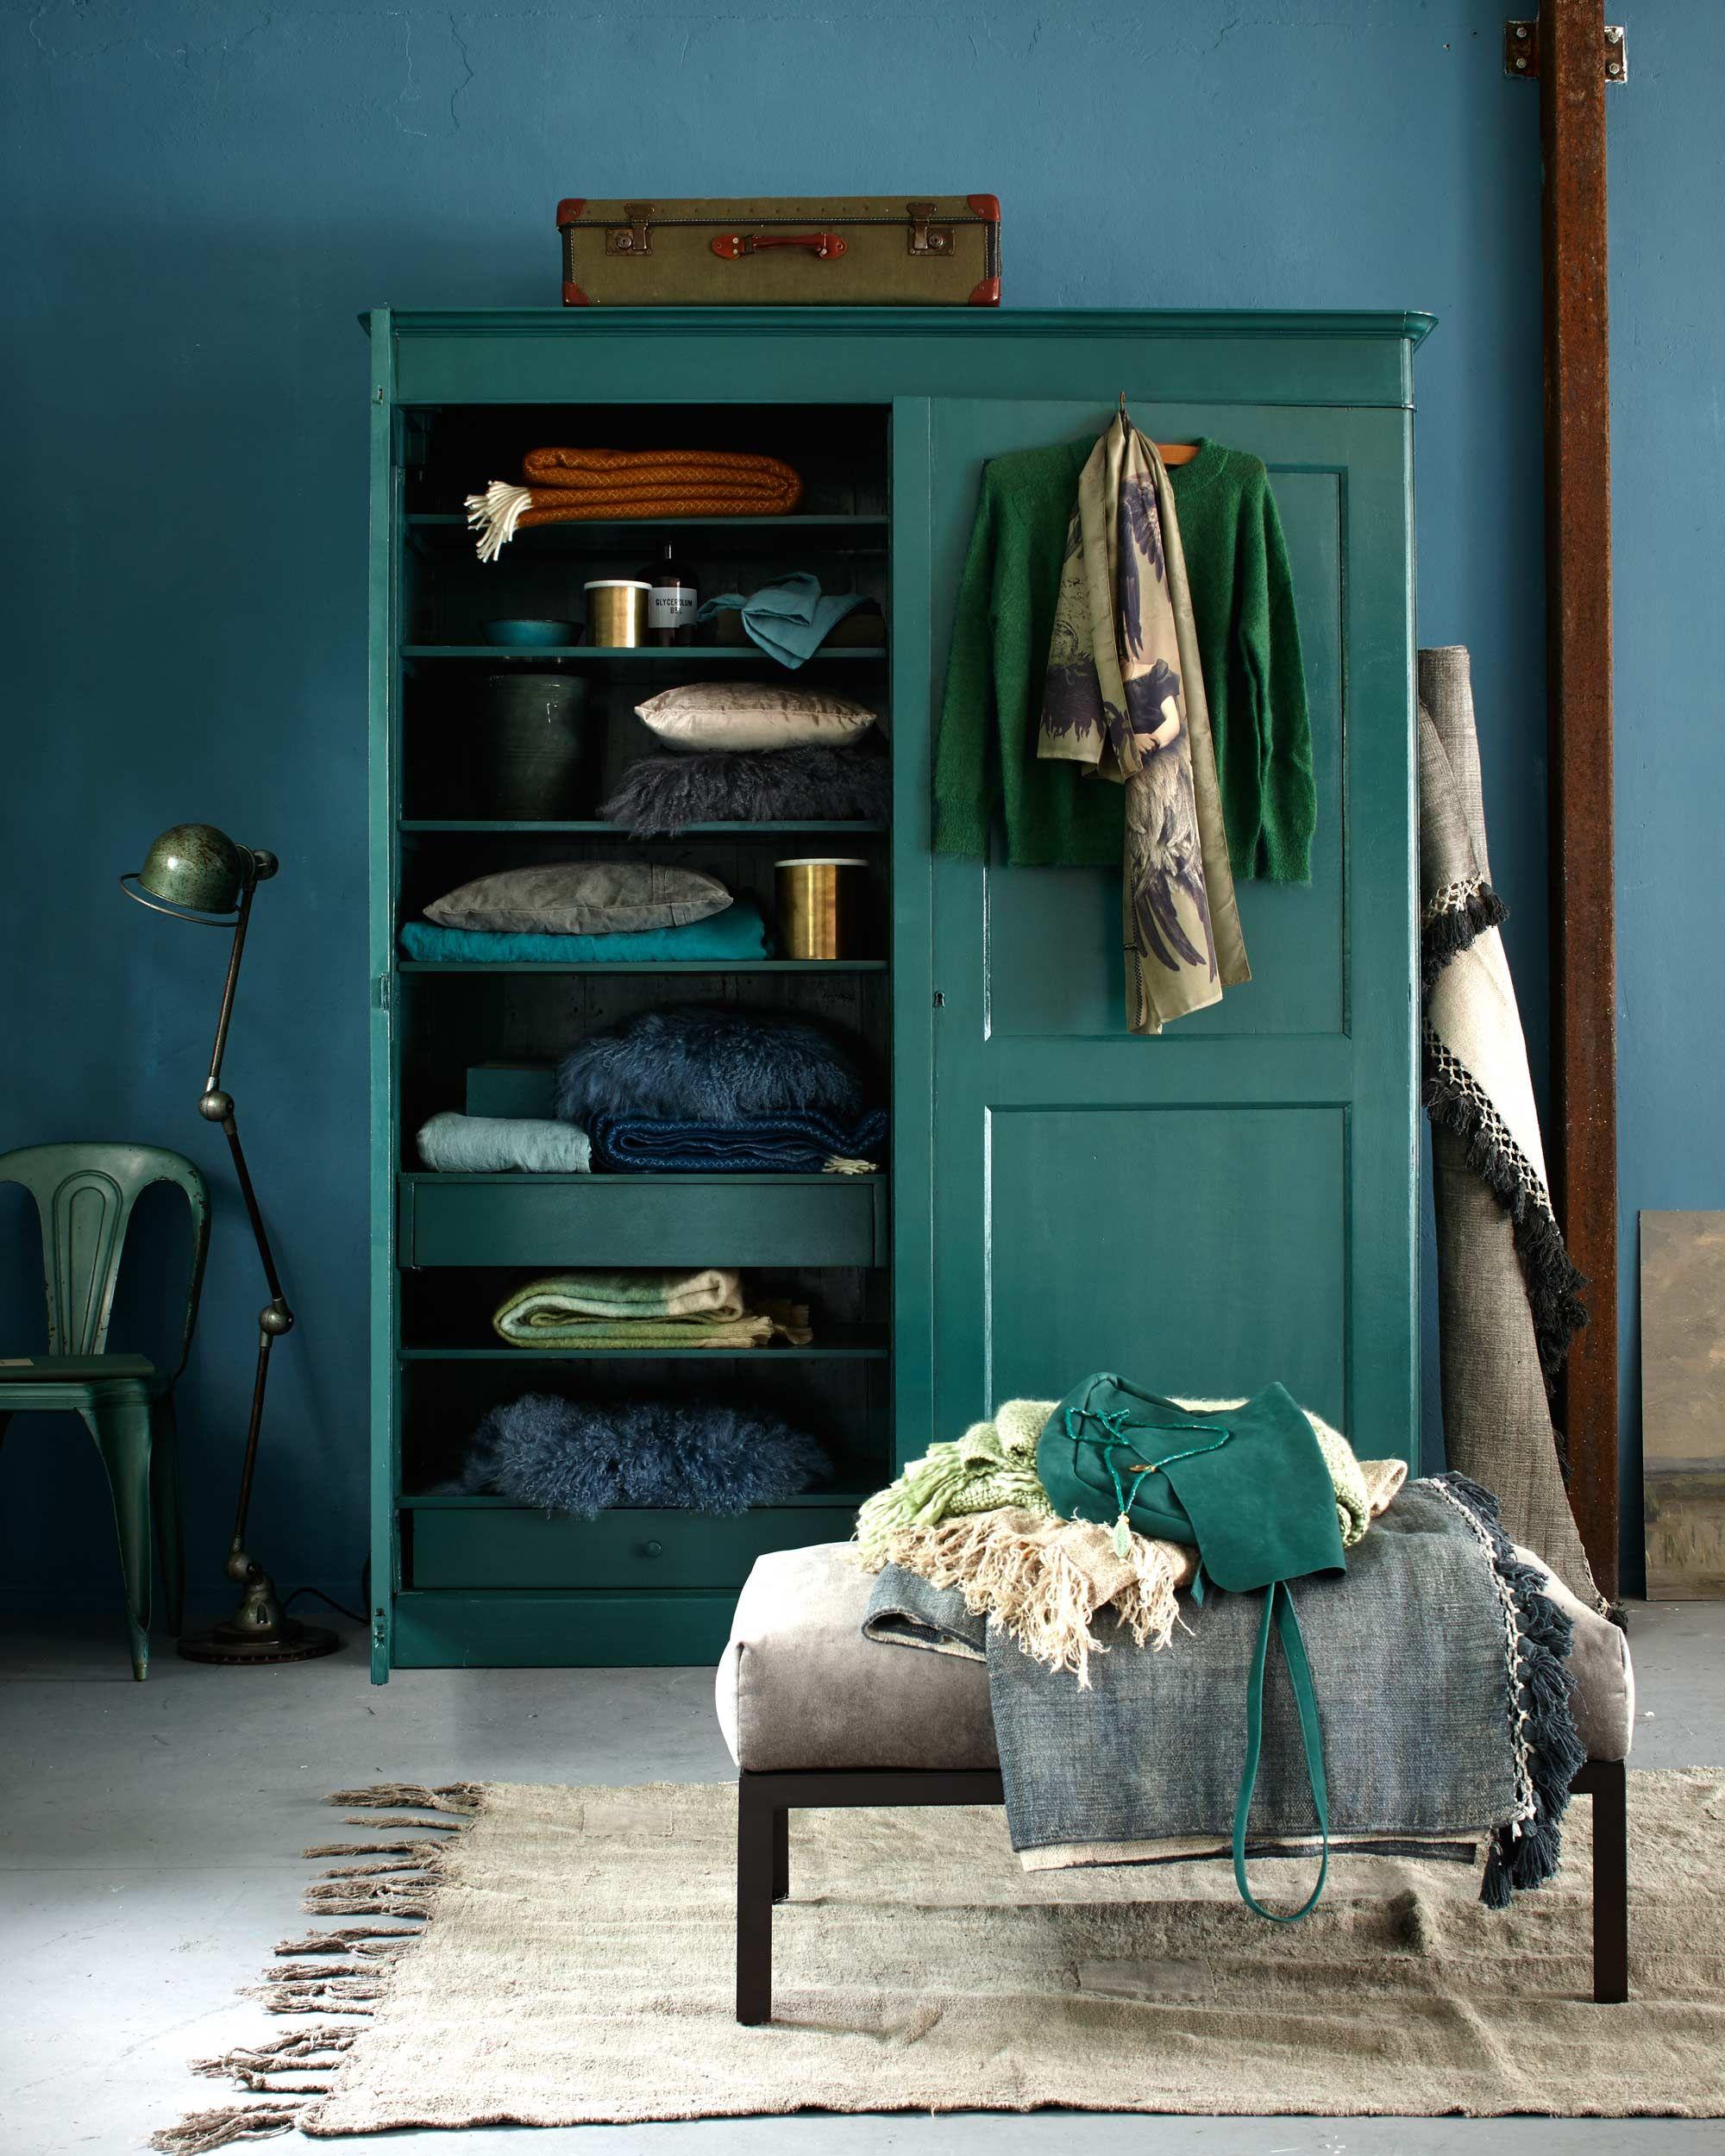 Groene kast | Green closet | Photographer Jeroen van der Spek | Styling Cleo Scheulderman | vtwonen November 2015